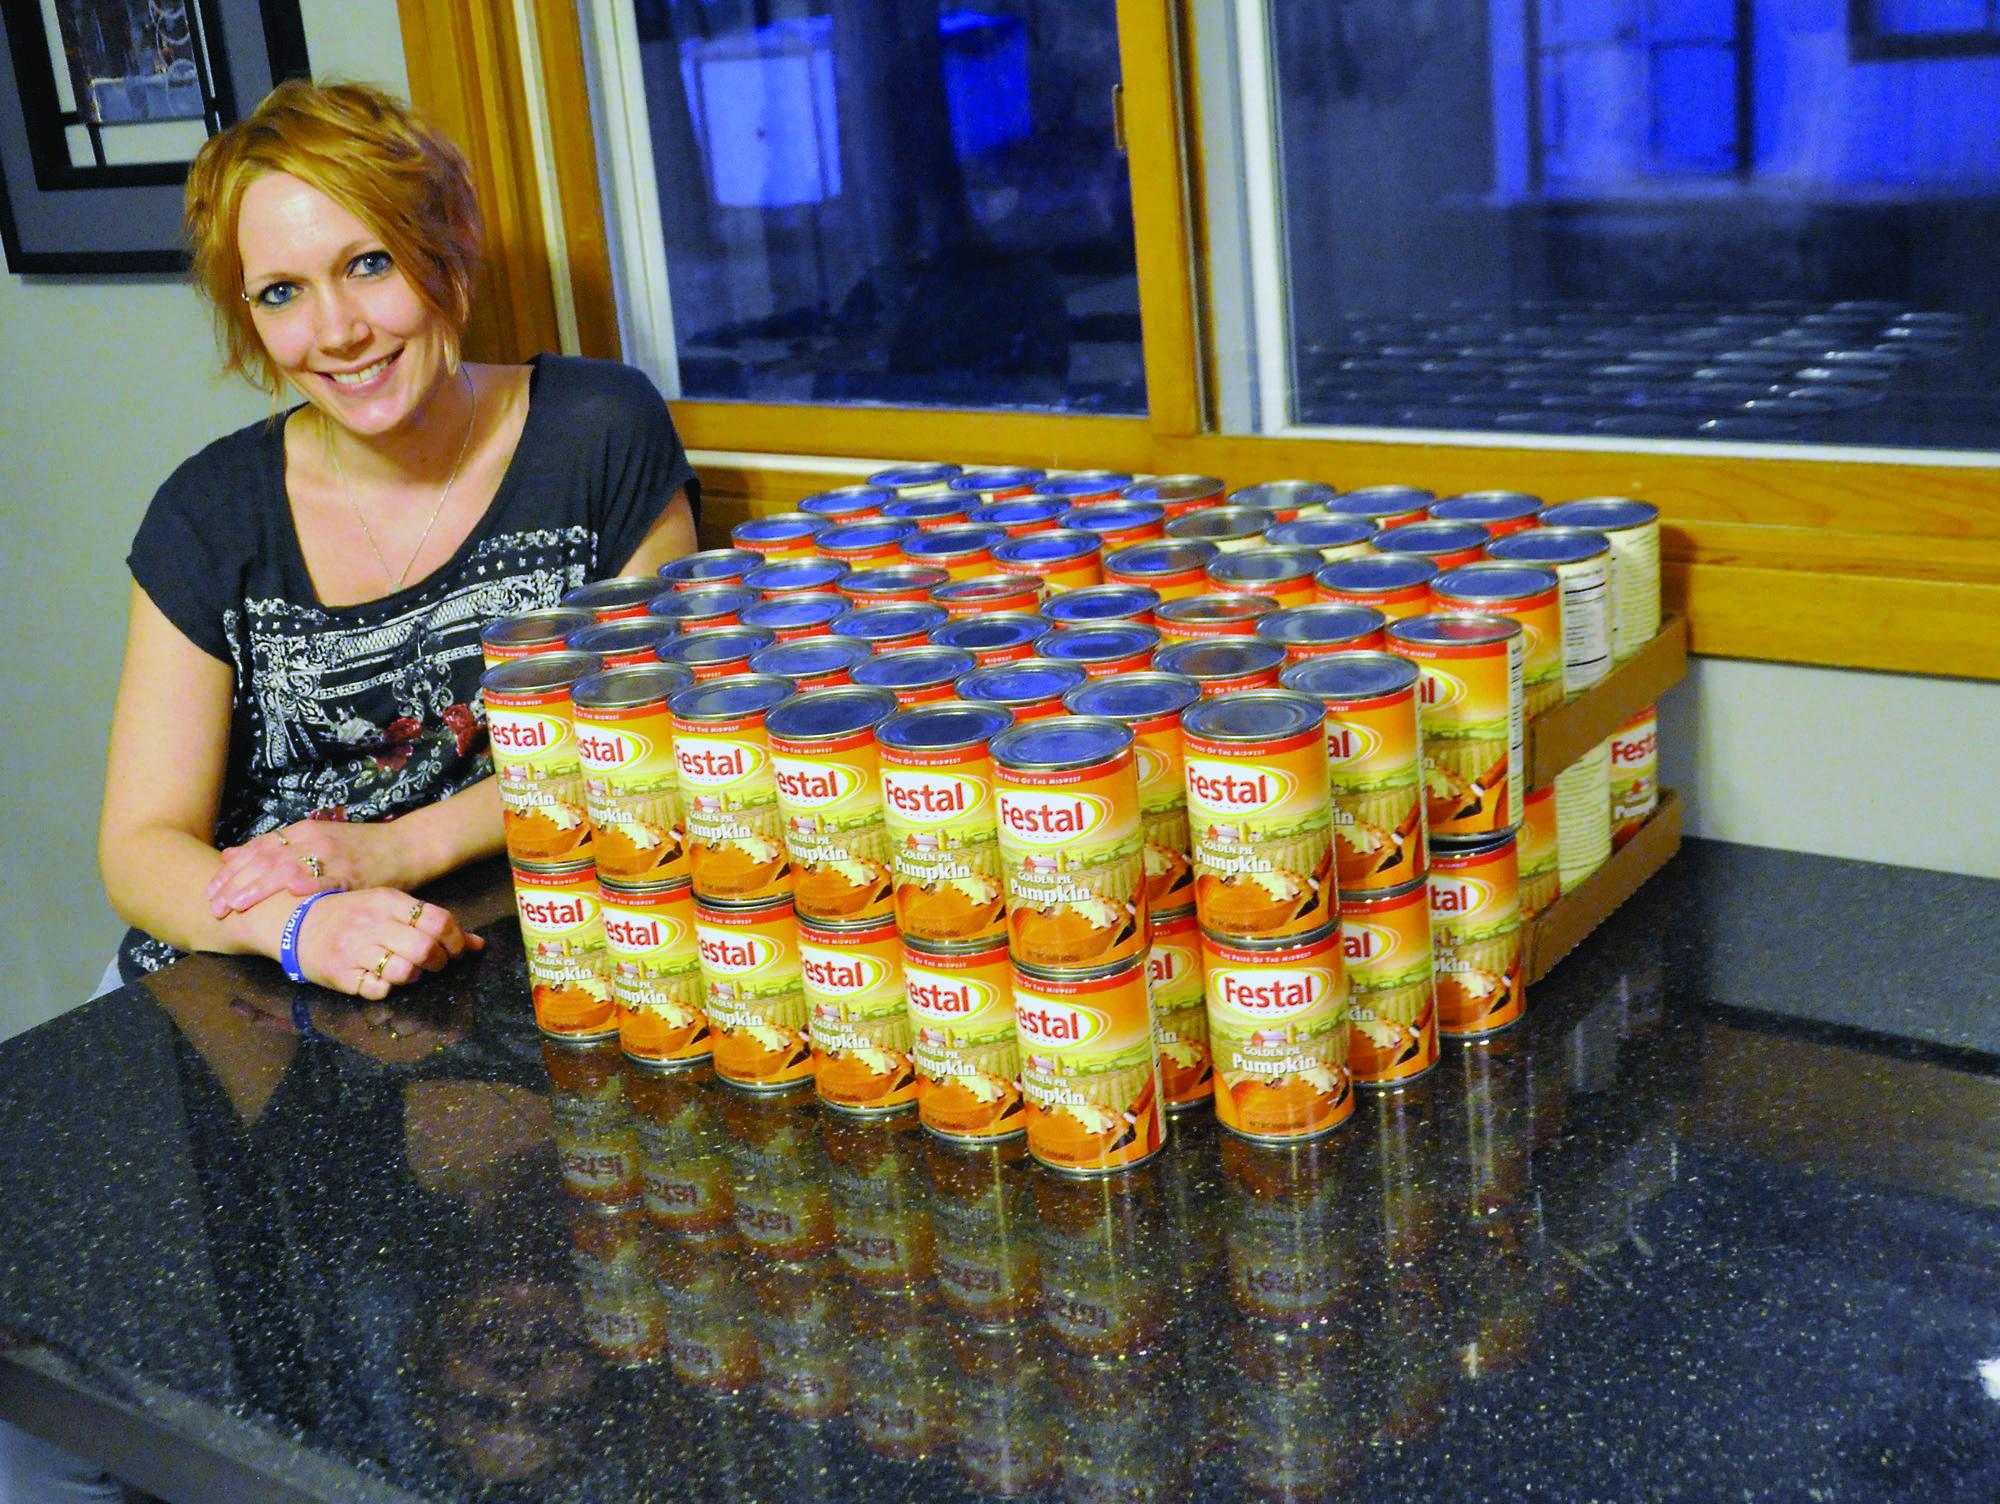 Angie Probst shows off her stash of Festal pumpkin pie filling in 2015.